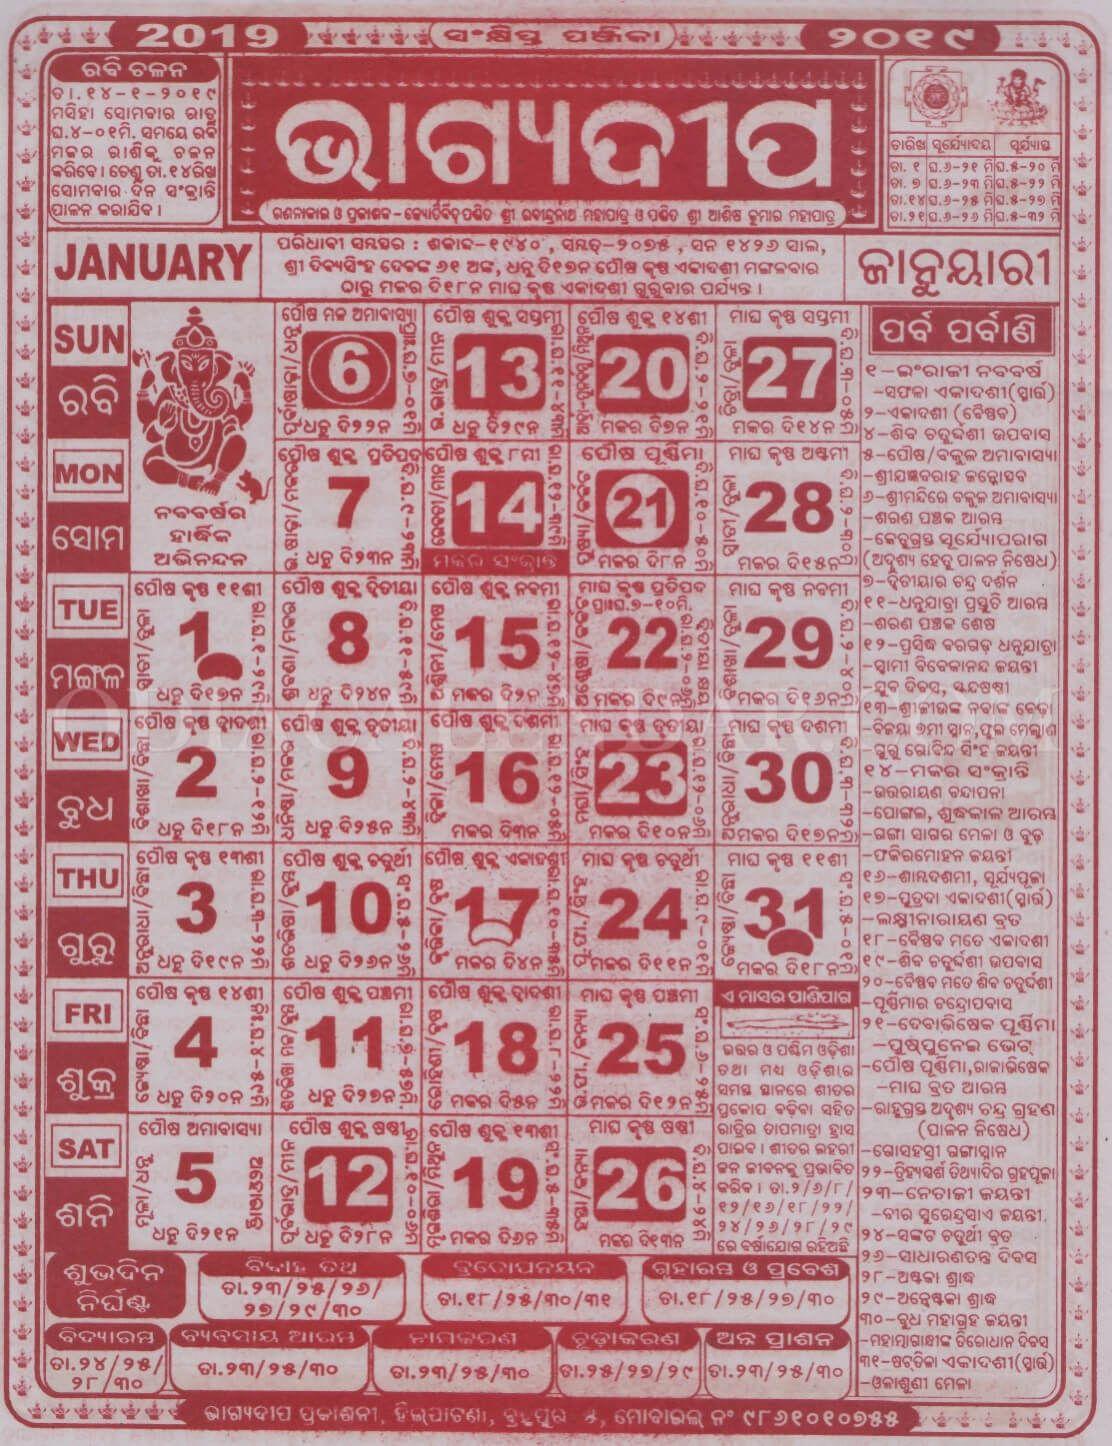 Bhagyadeep Calendar January 2019 | Calendar, Free, High in Bhagyadipa Odia Calendar 2020